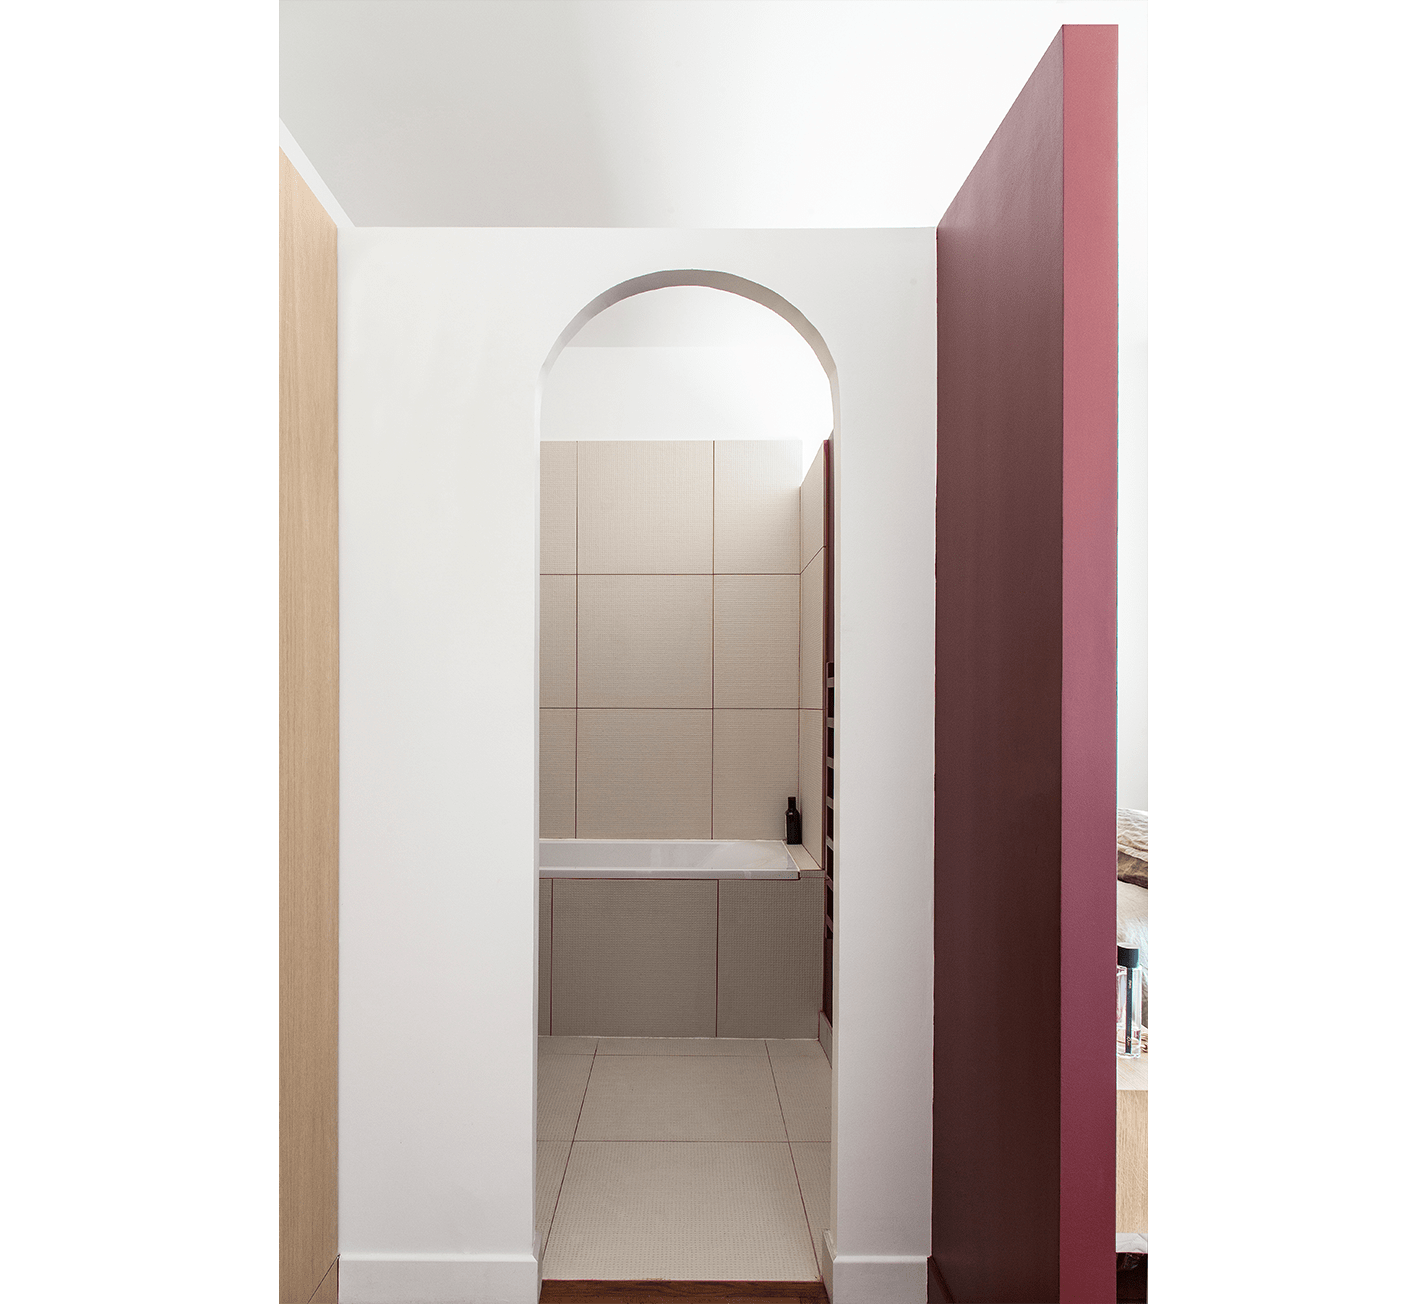 Projet-Alfred-Atelier-Steve-Pauline-Borgia-Architecture-interieur-07-min